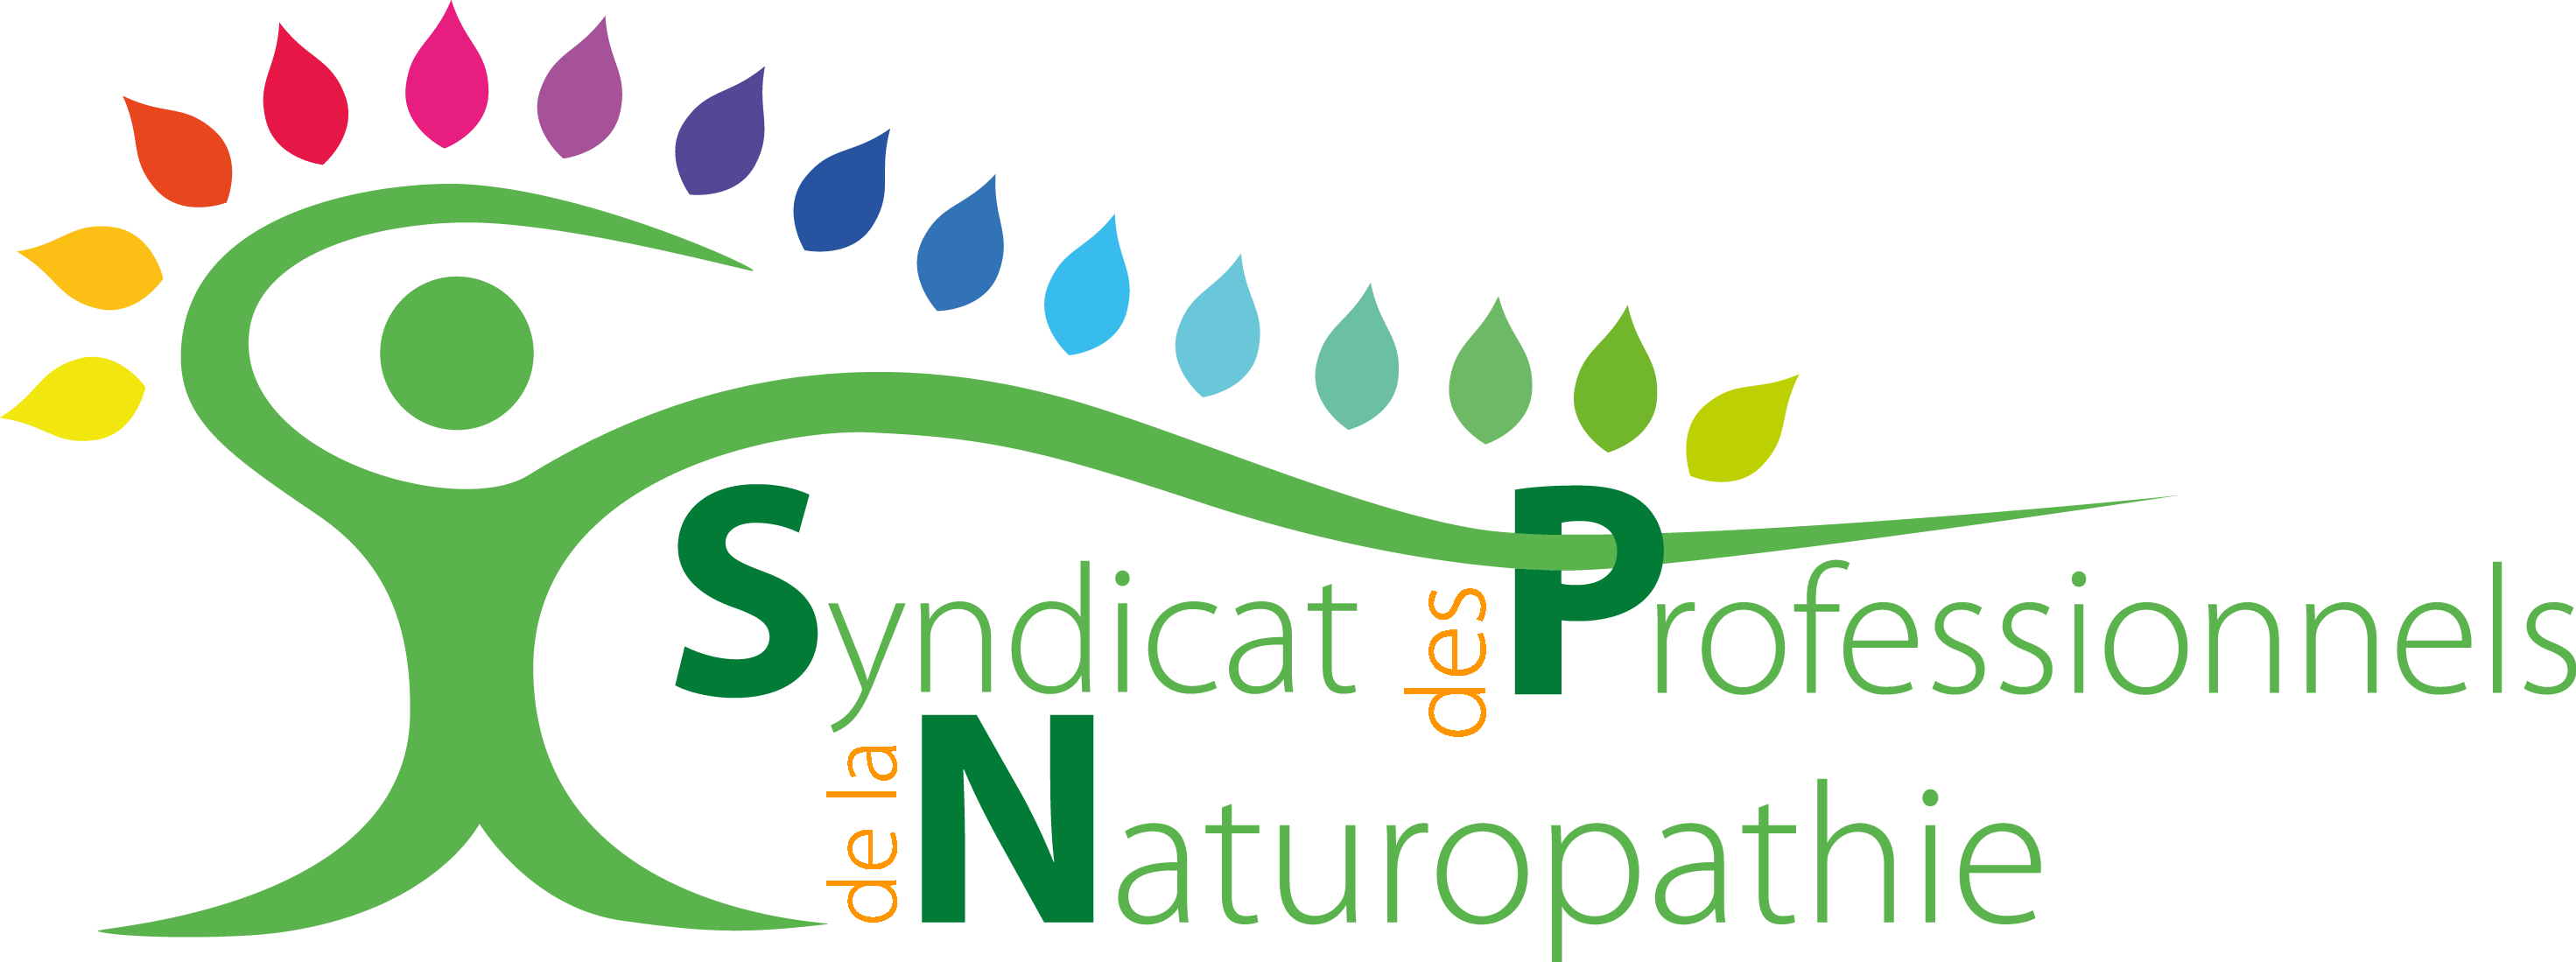 Annuaire du Syndicat Naturopathie